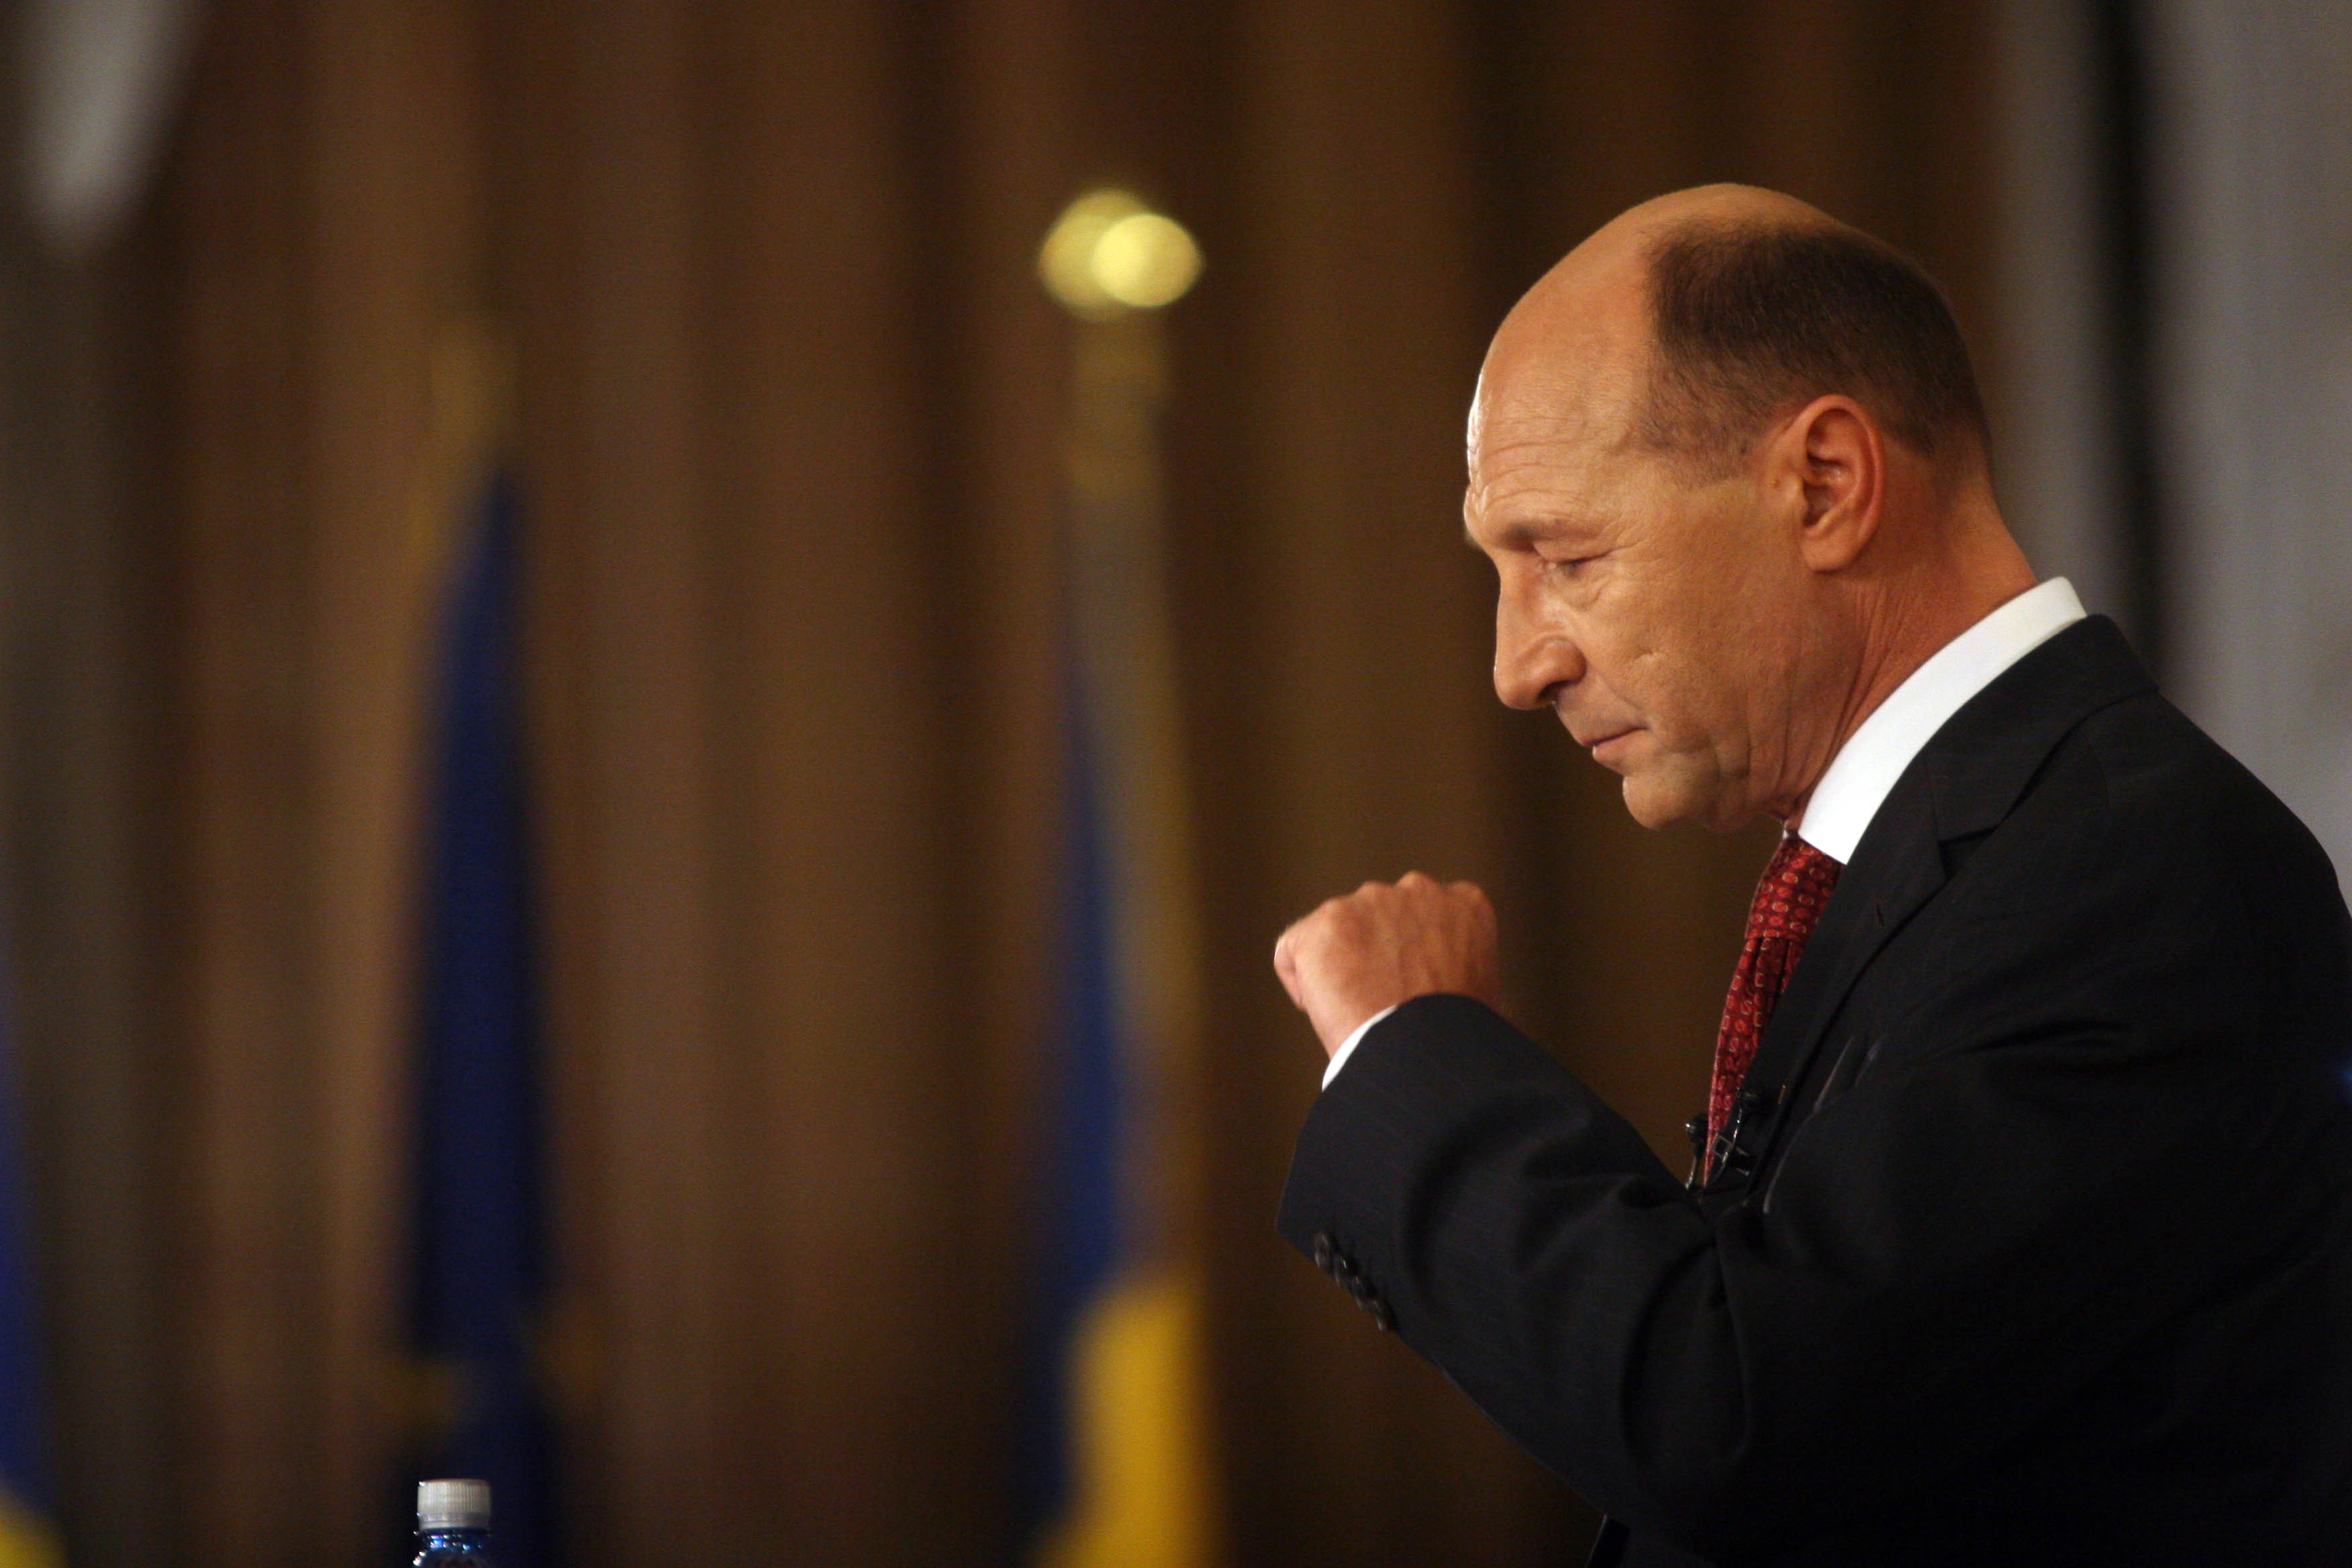 Presedintele Republicii Moldova, Nicolae Timofti, i-a acordat Ordinul